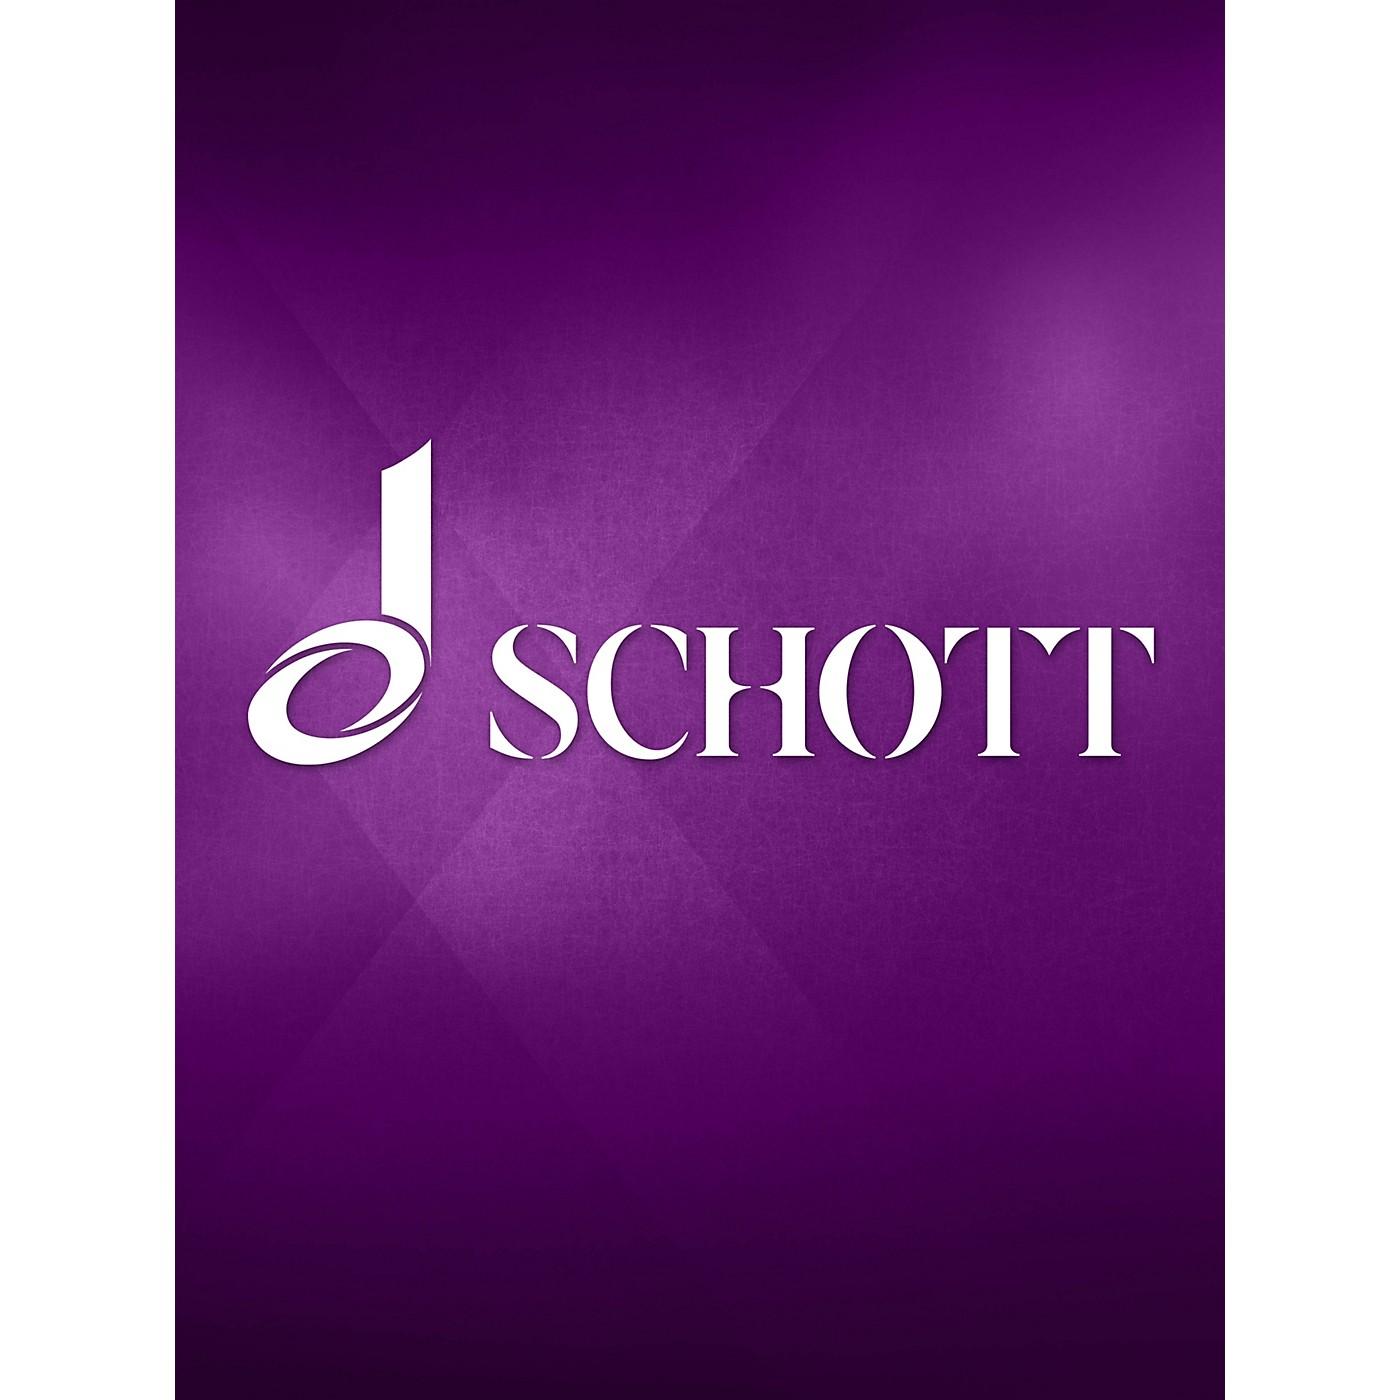 Schott Elf Transparente (Study Score) Schott Series Composed by Ernst Krenek thumbnail